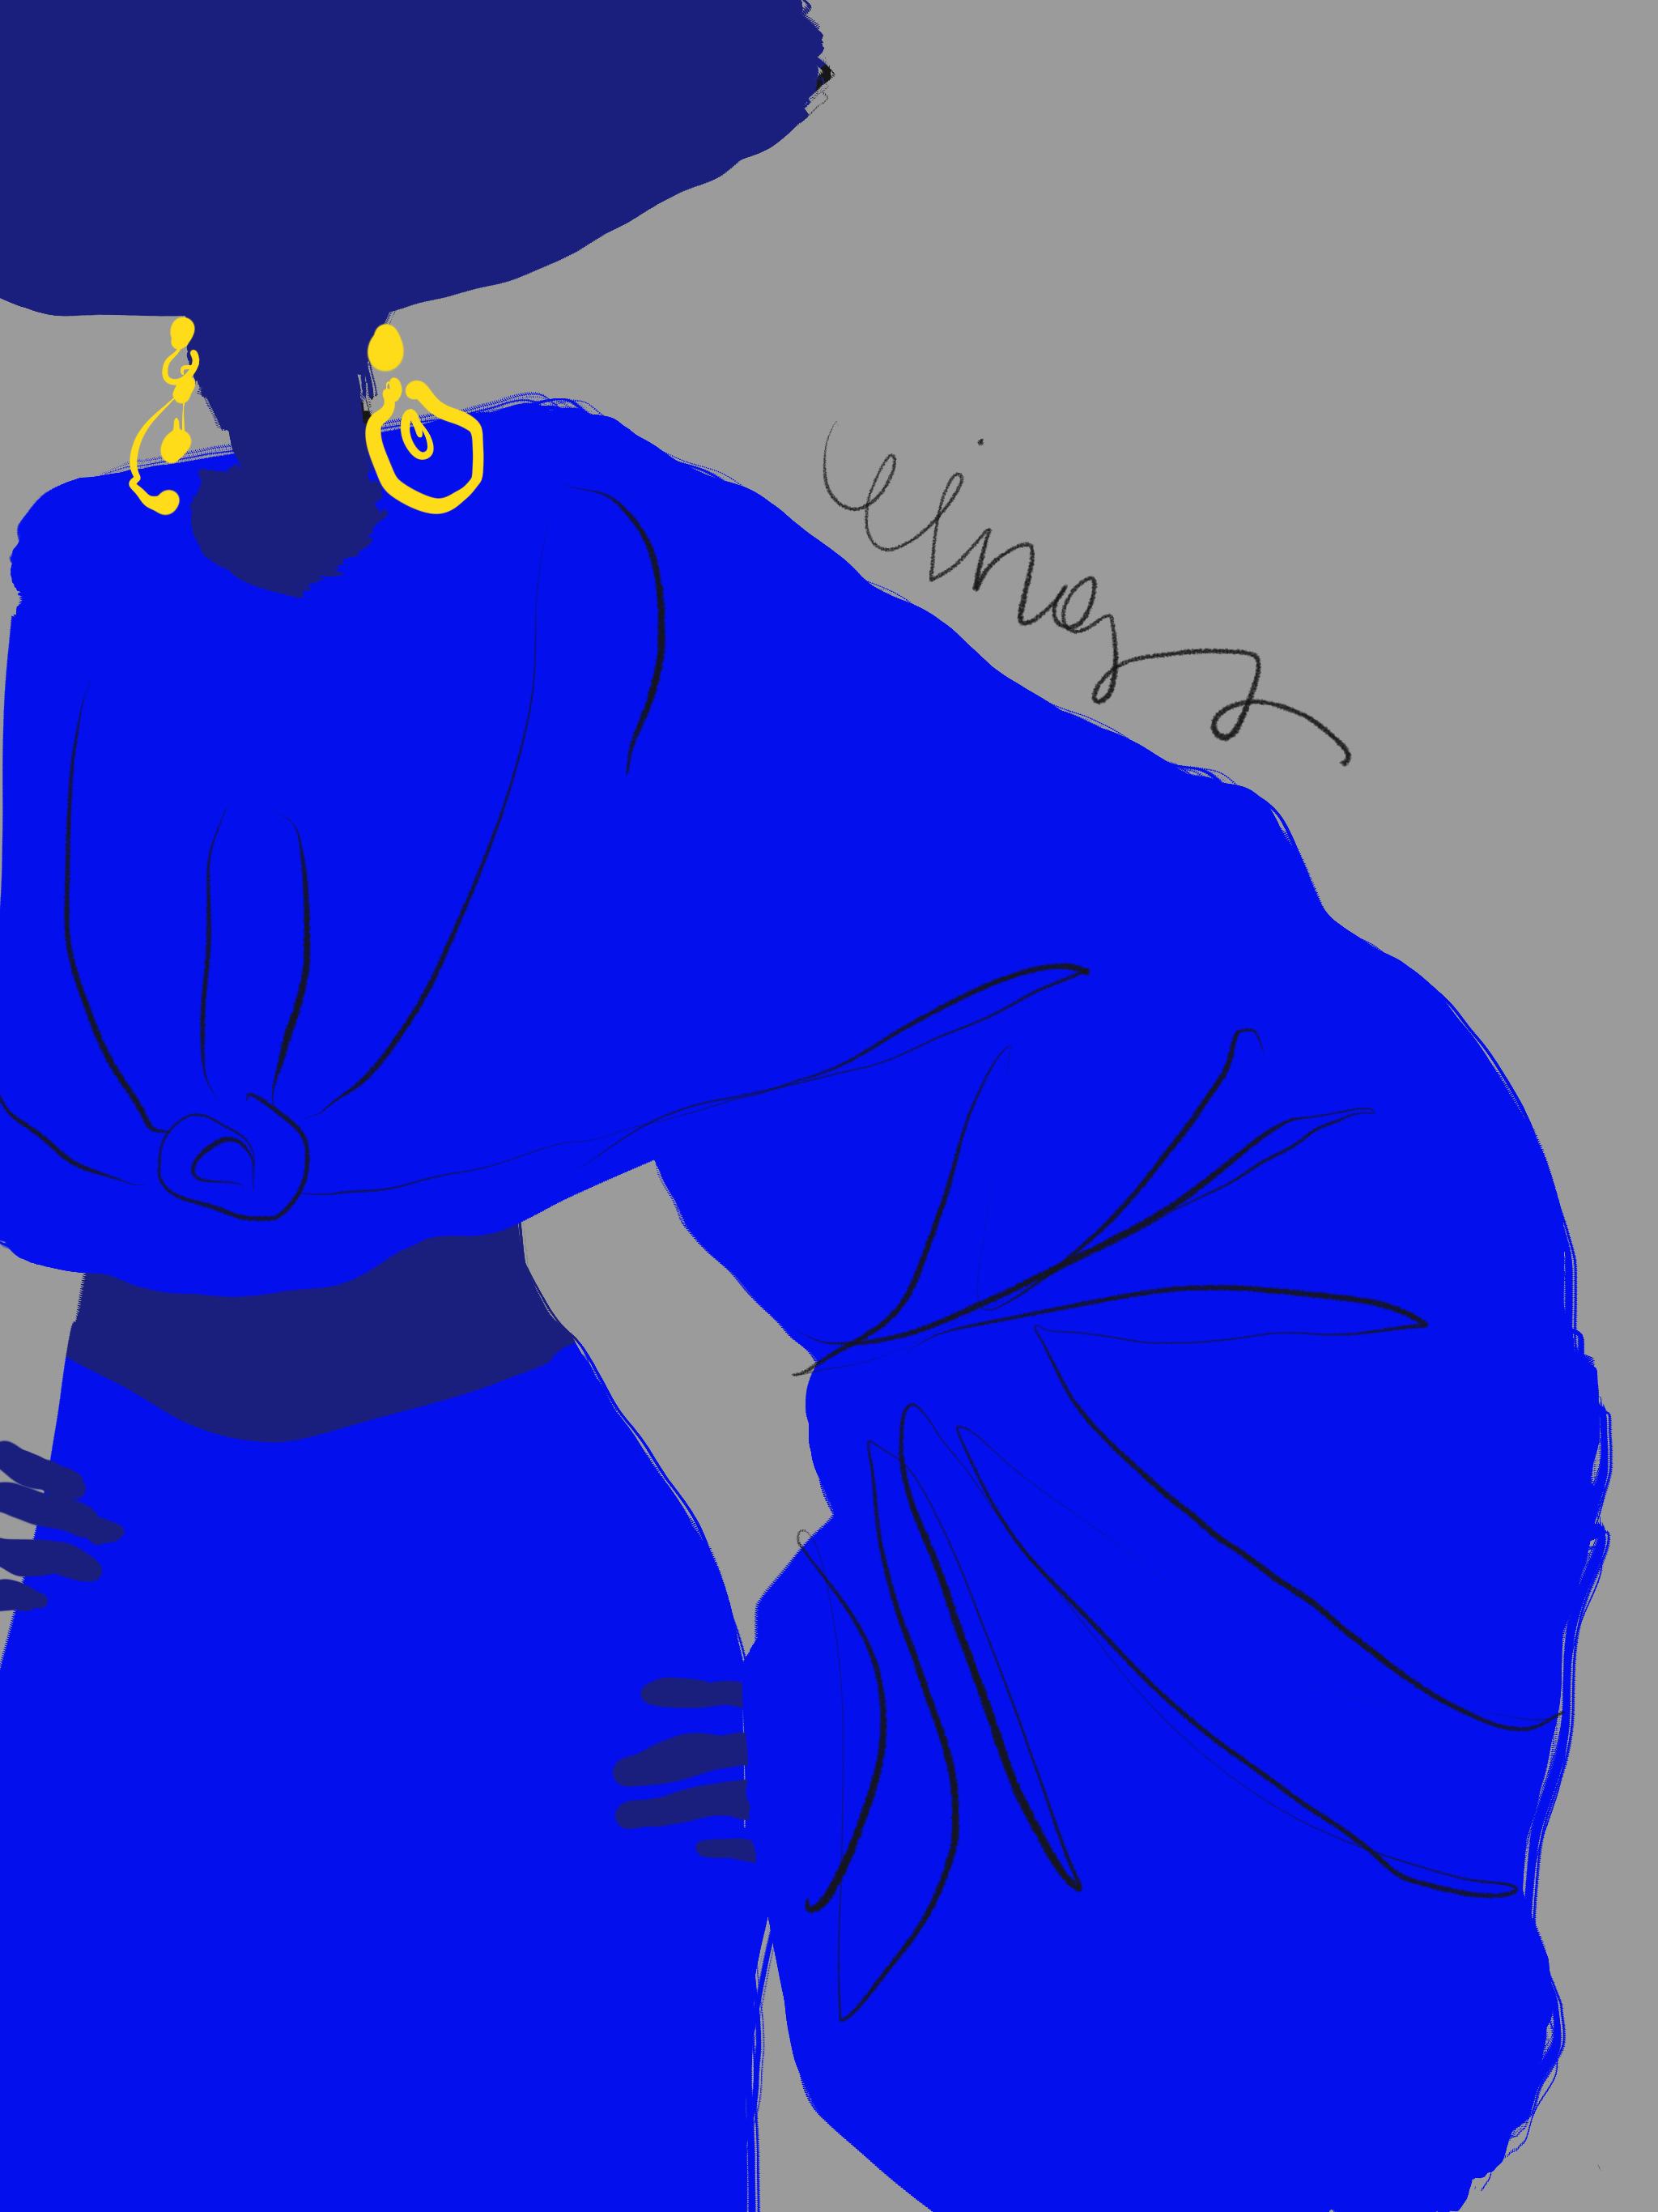 Blue fashion, Illustration by Silvana Mariani, 2021